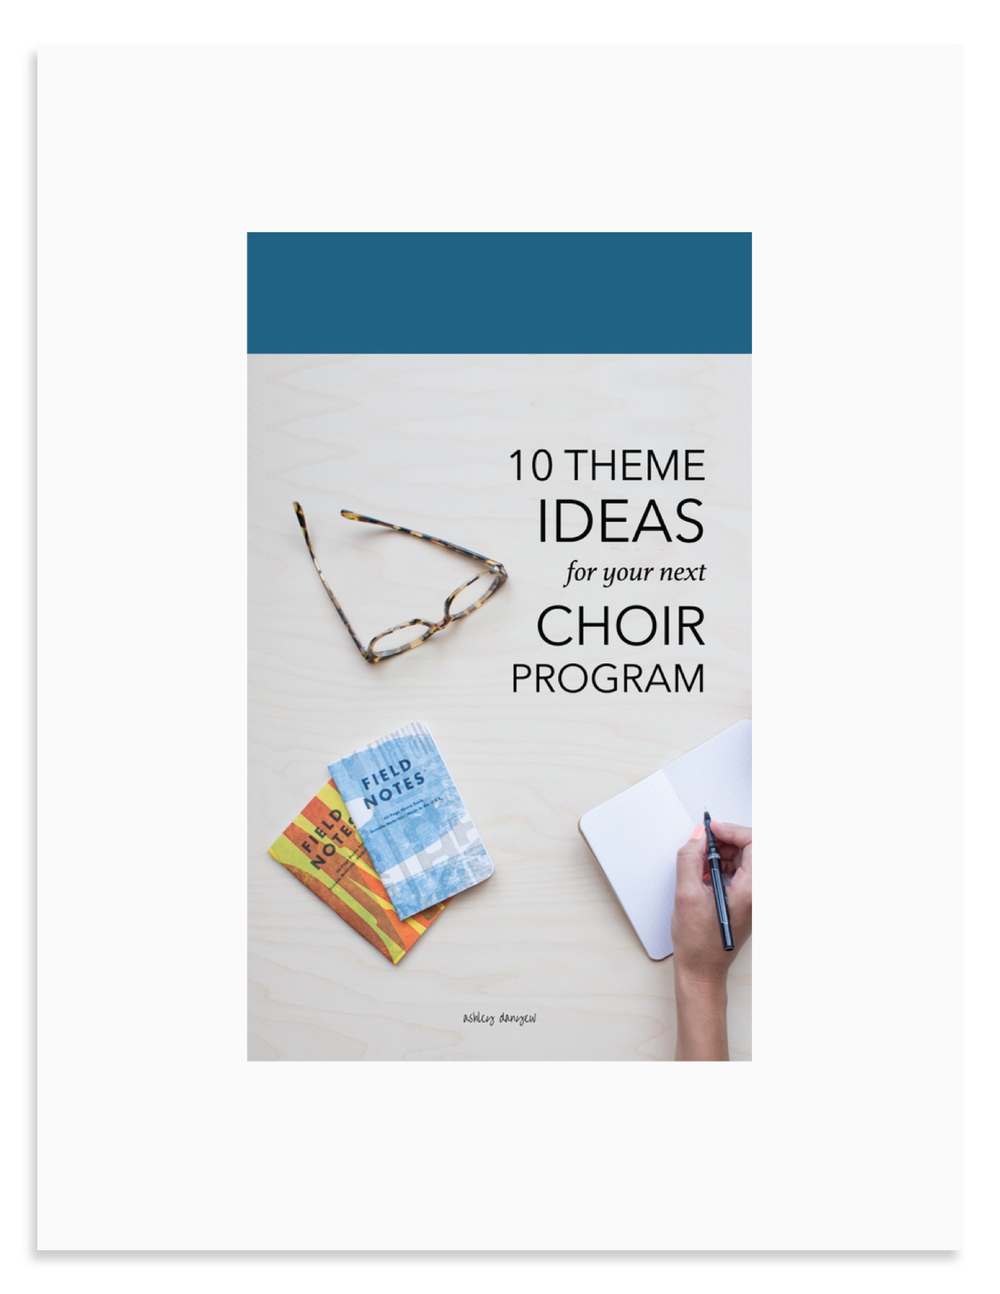 10 Theme Ideas for Your Next Choir Program Workbook-23.png